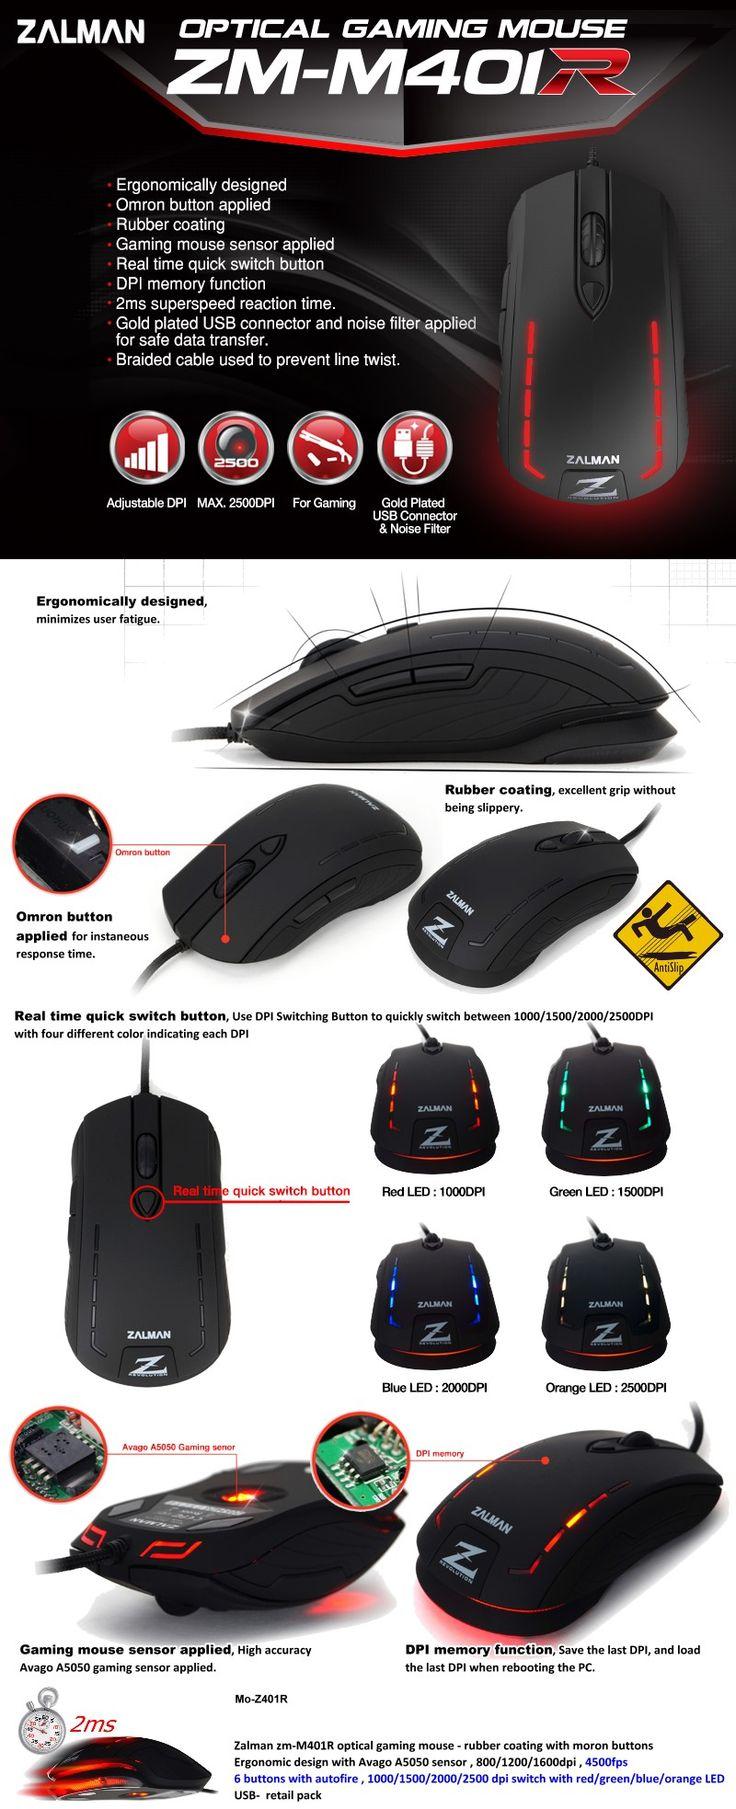 Zalman ZM-M40IR Optical Gaming Mouse